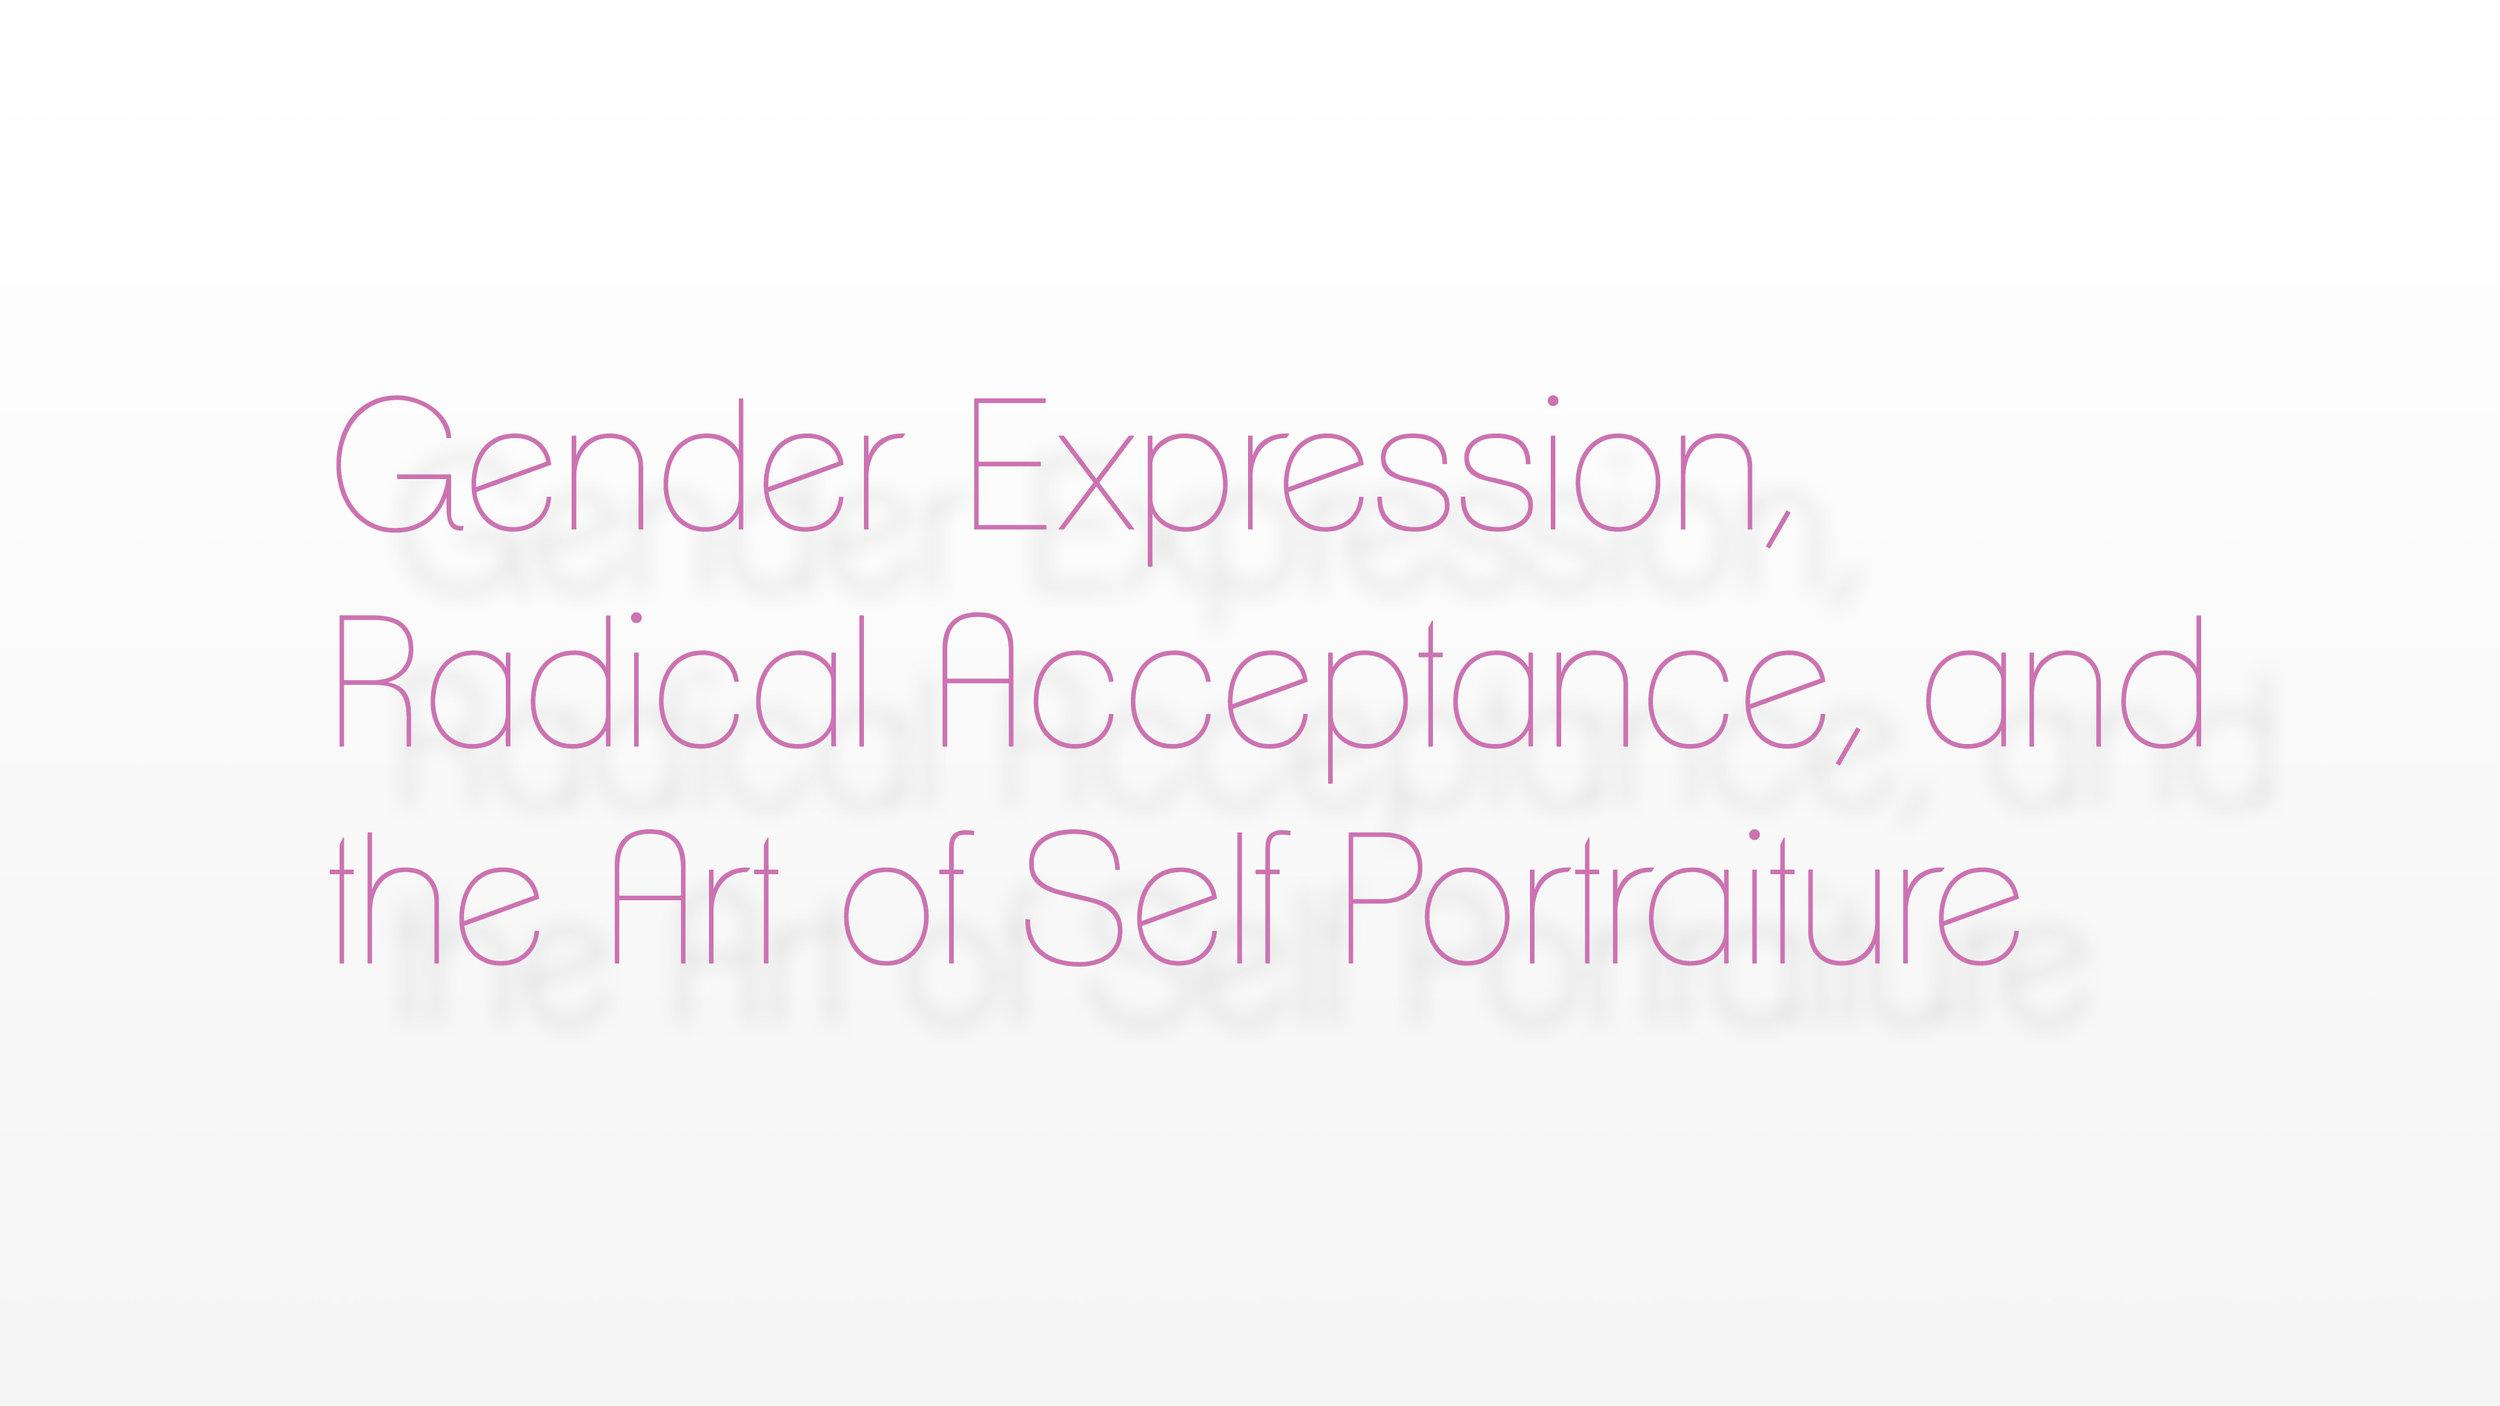 Gender Expression Workshop Graphic.jpg